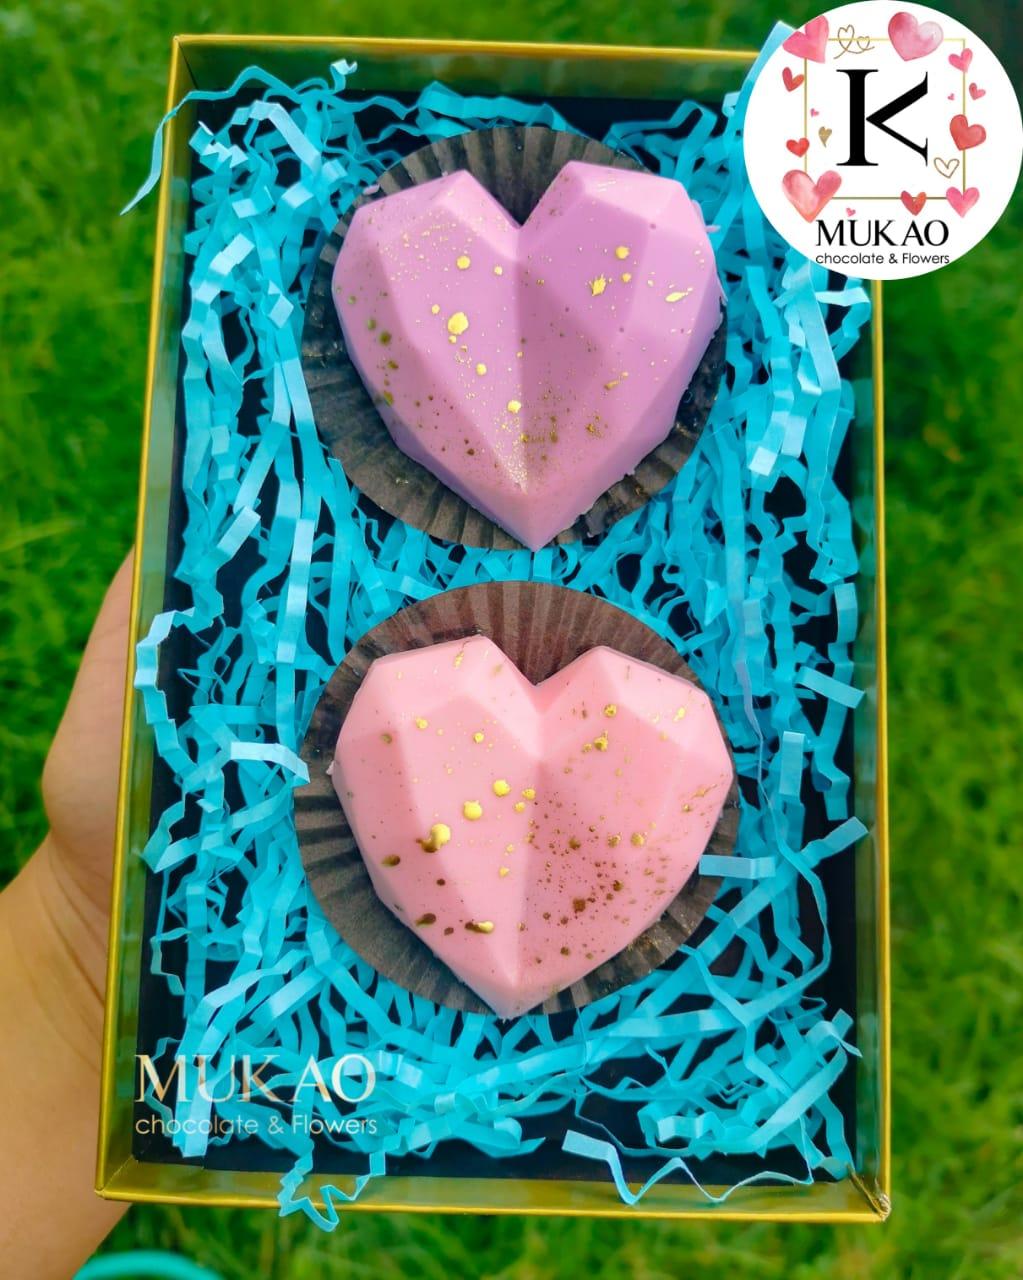 mini-corazones-de-chocolate-con-rellenos